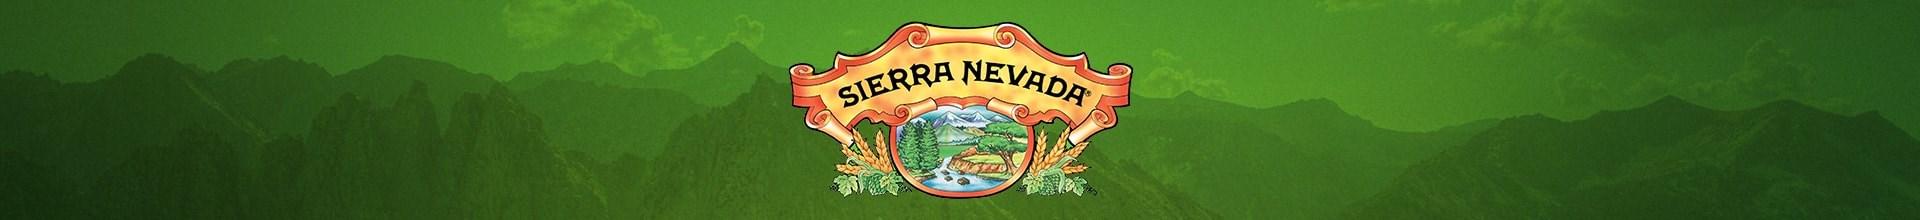 Cervejaria Sierra Nevada